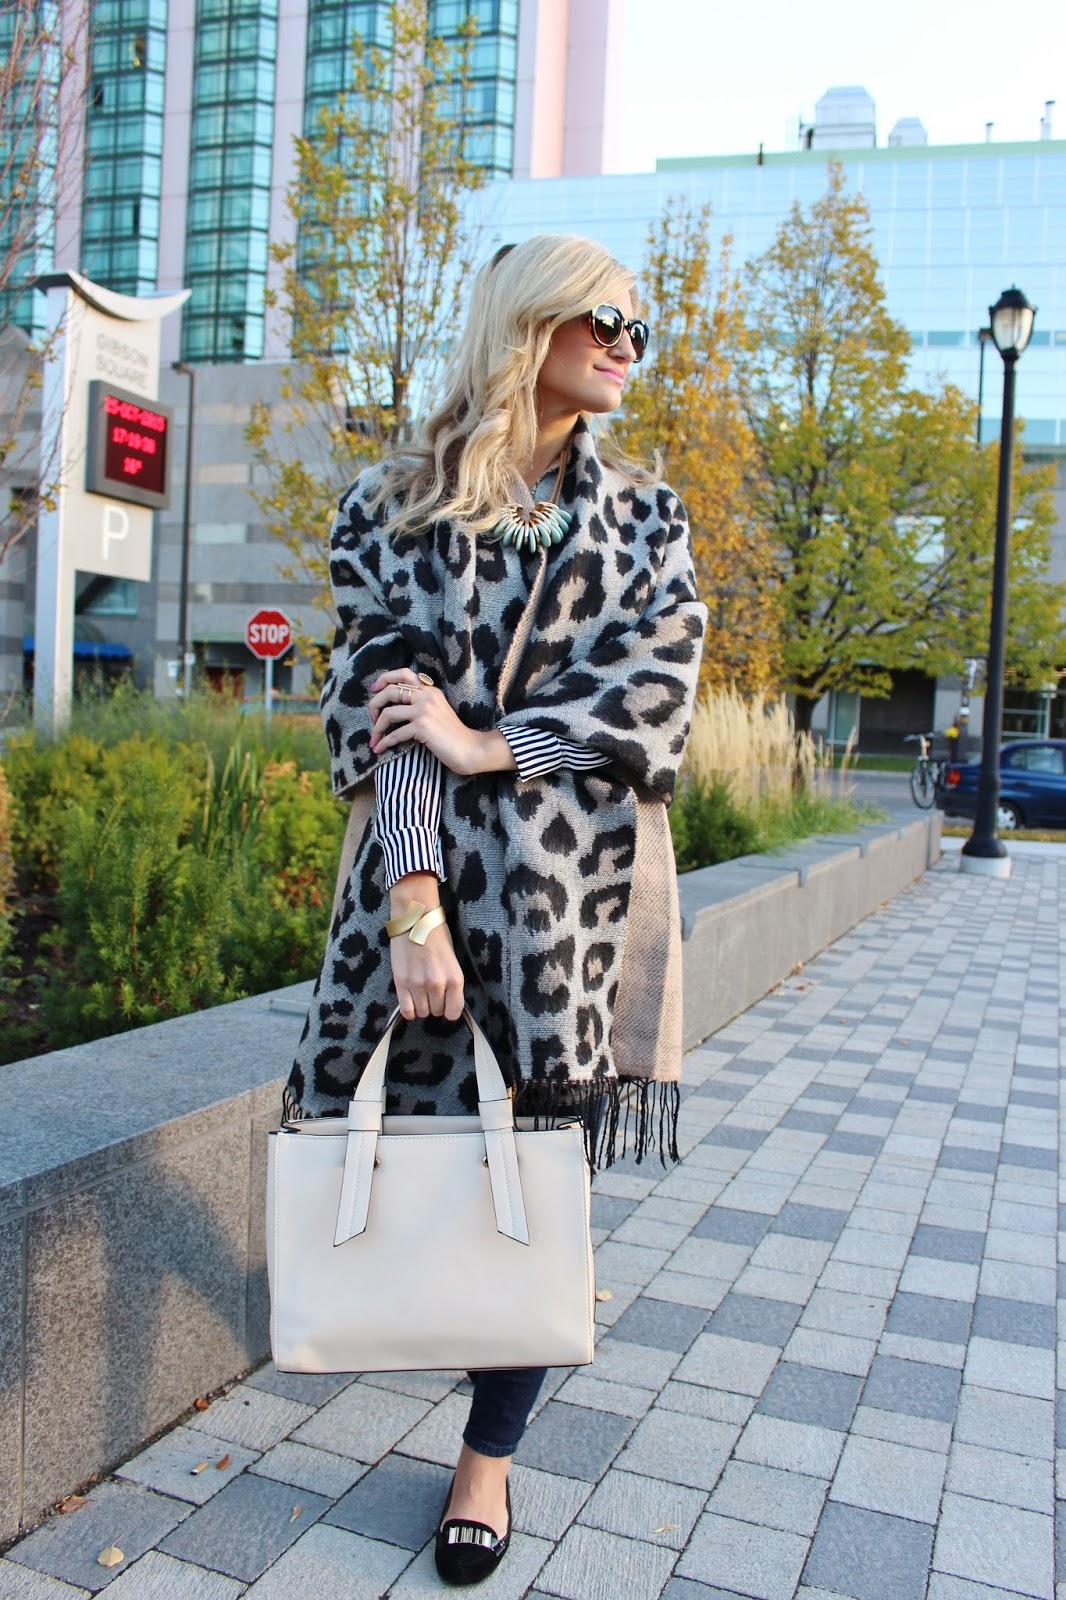 bijuleni - leopard scarf, jeans, and flats